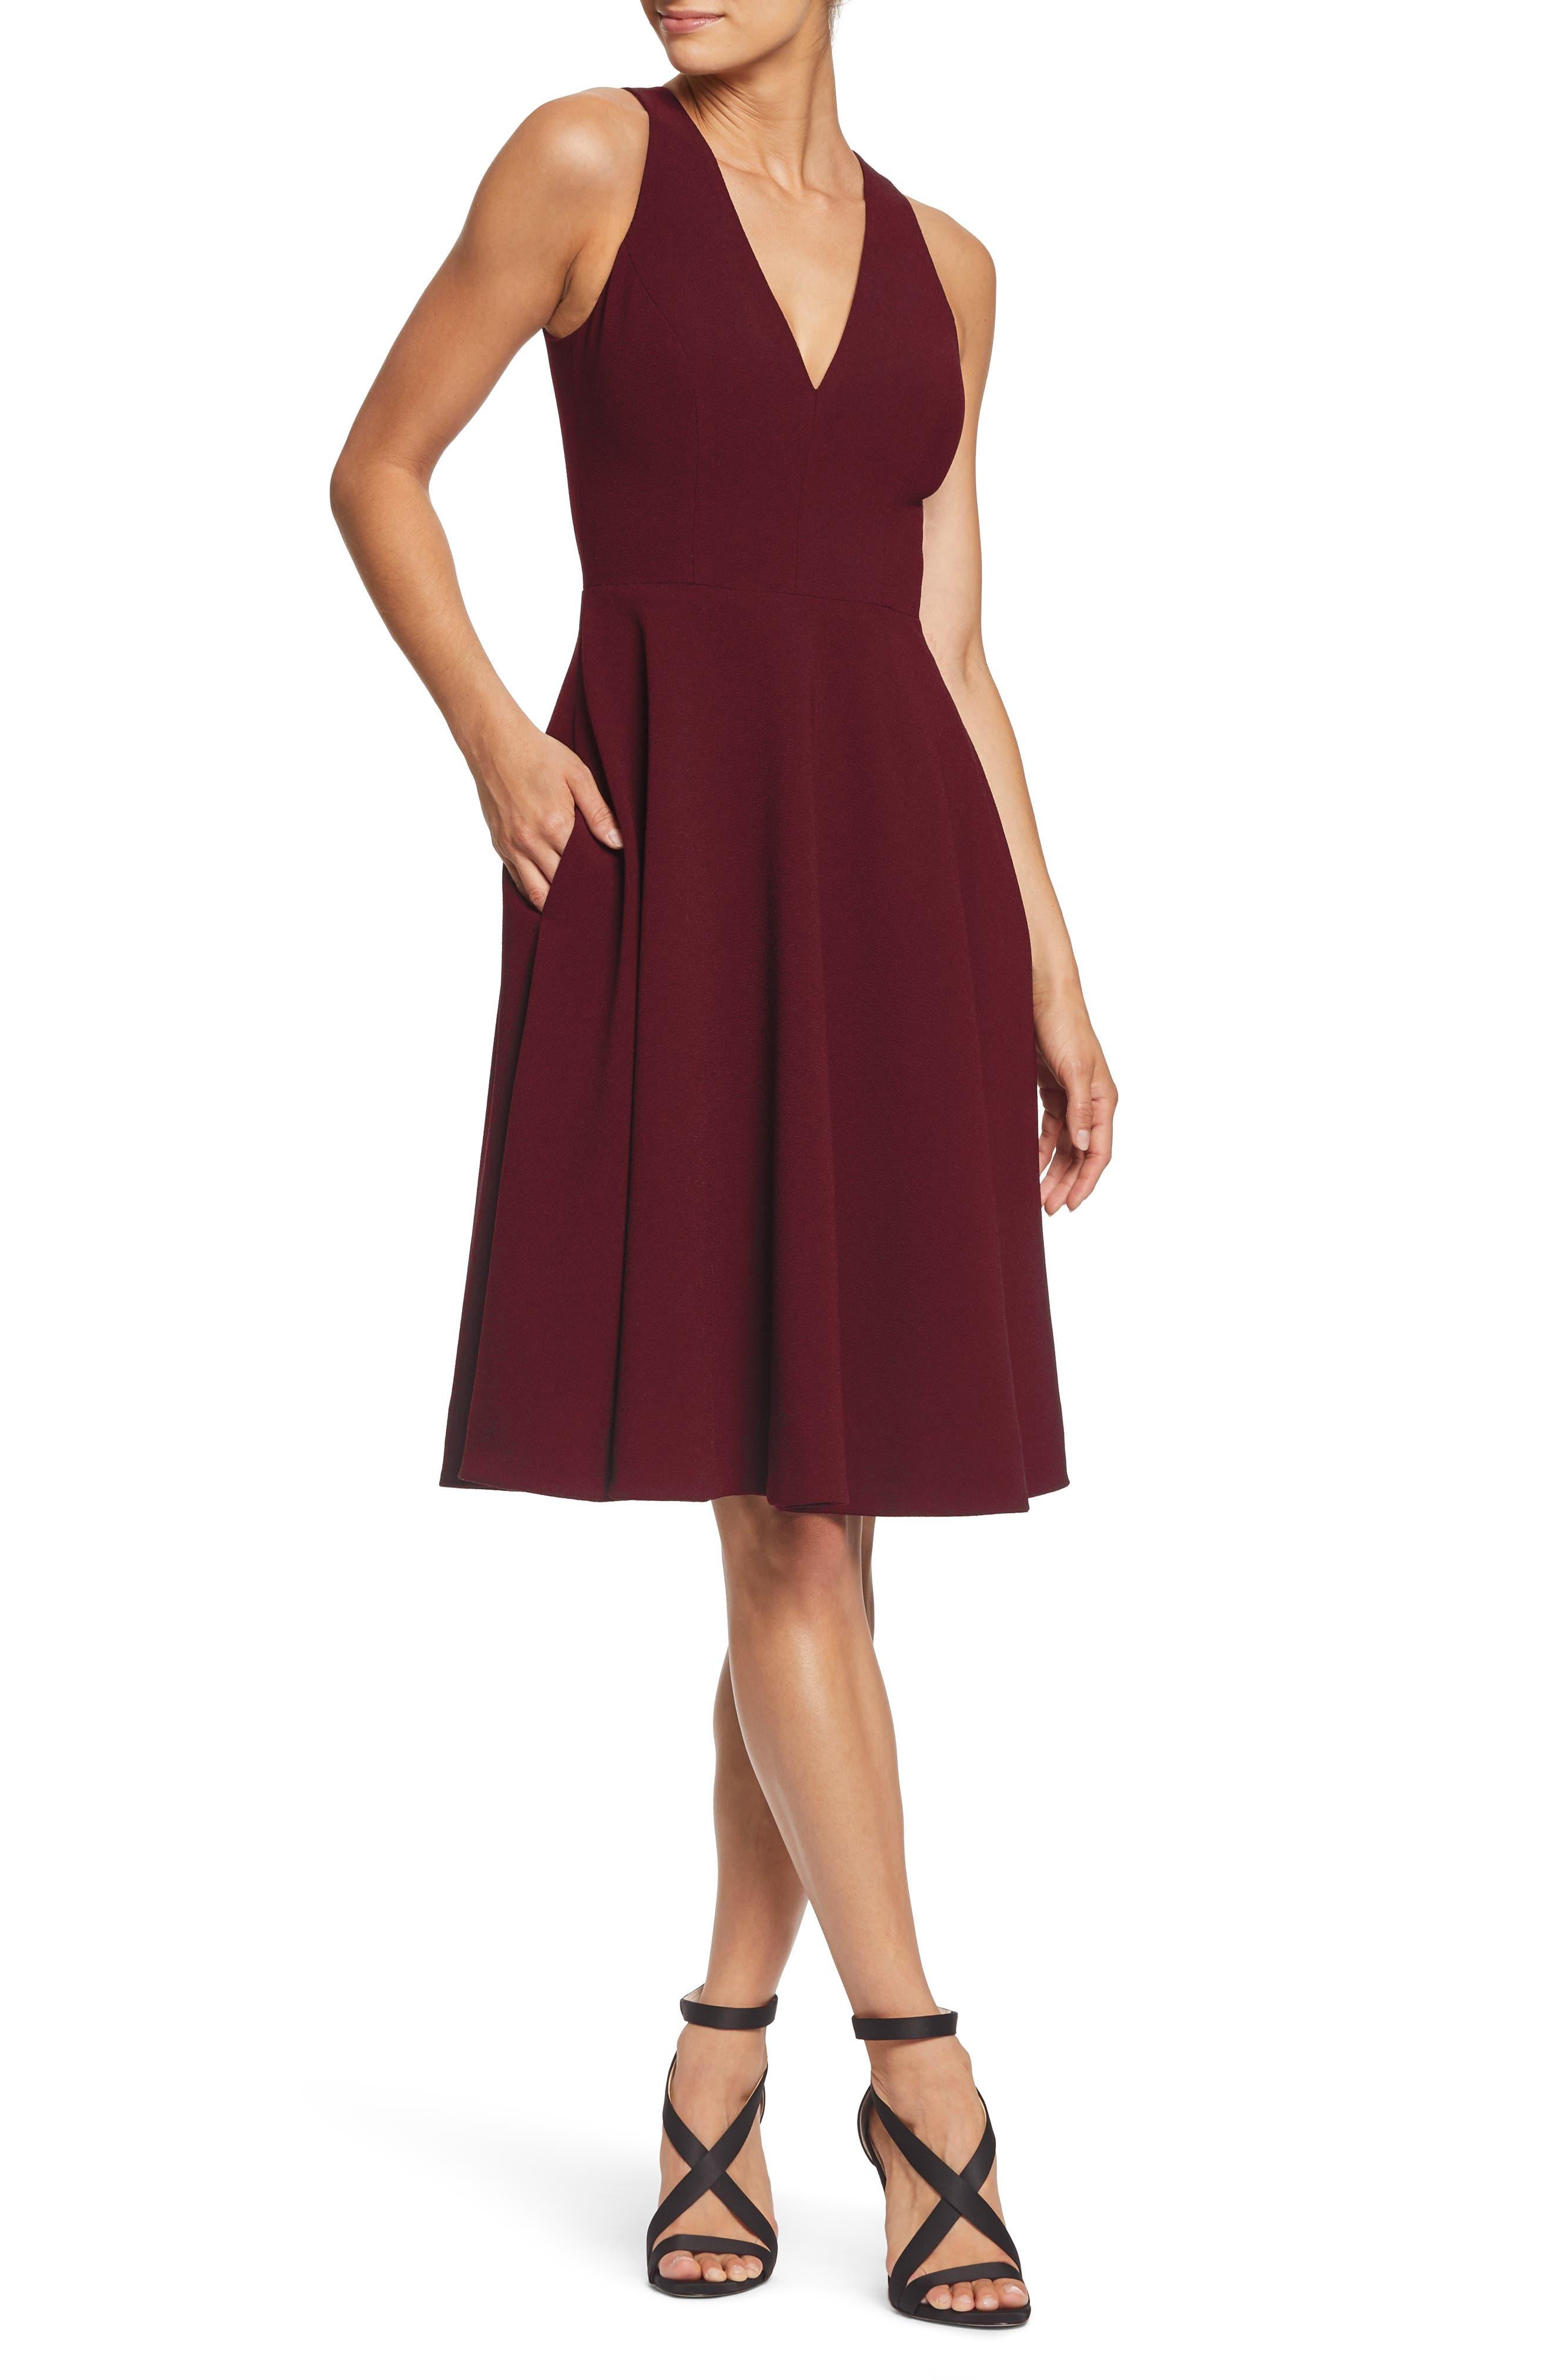 Dress The Population Catalina Tea Length Fit & Flare Dress, Burgundy